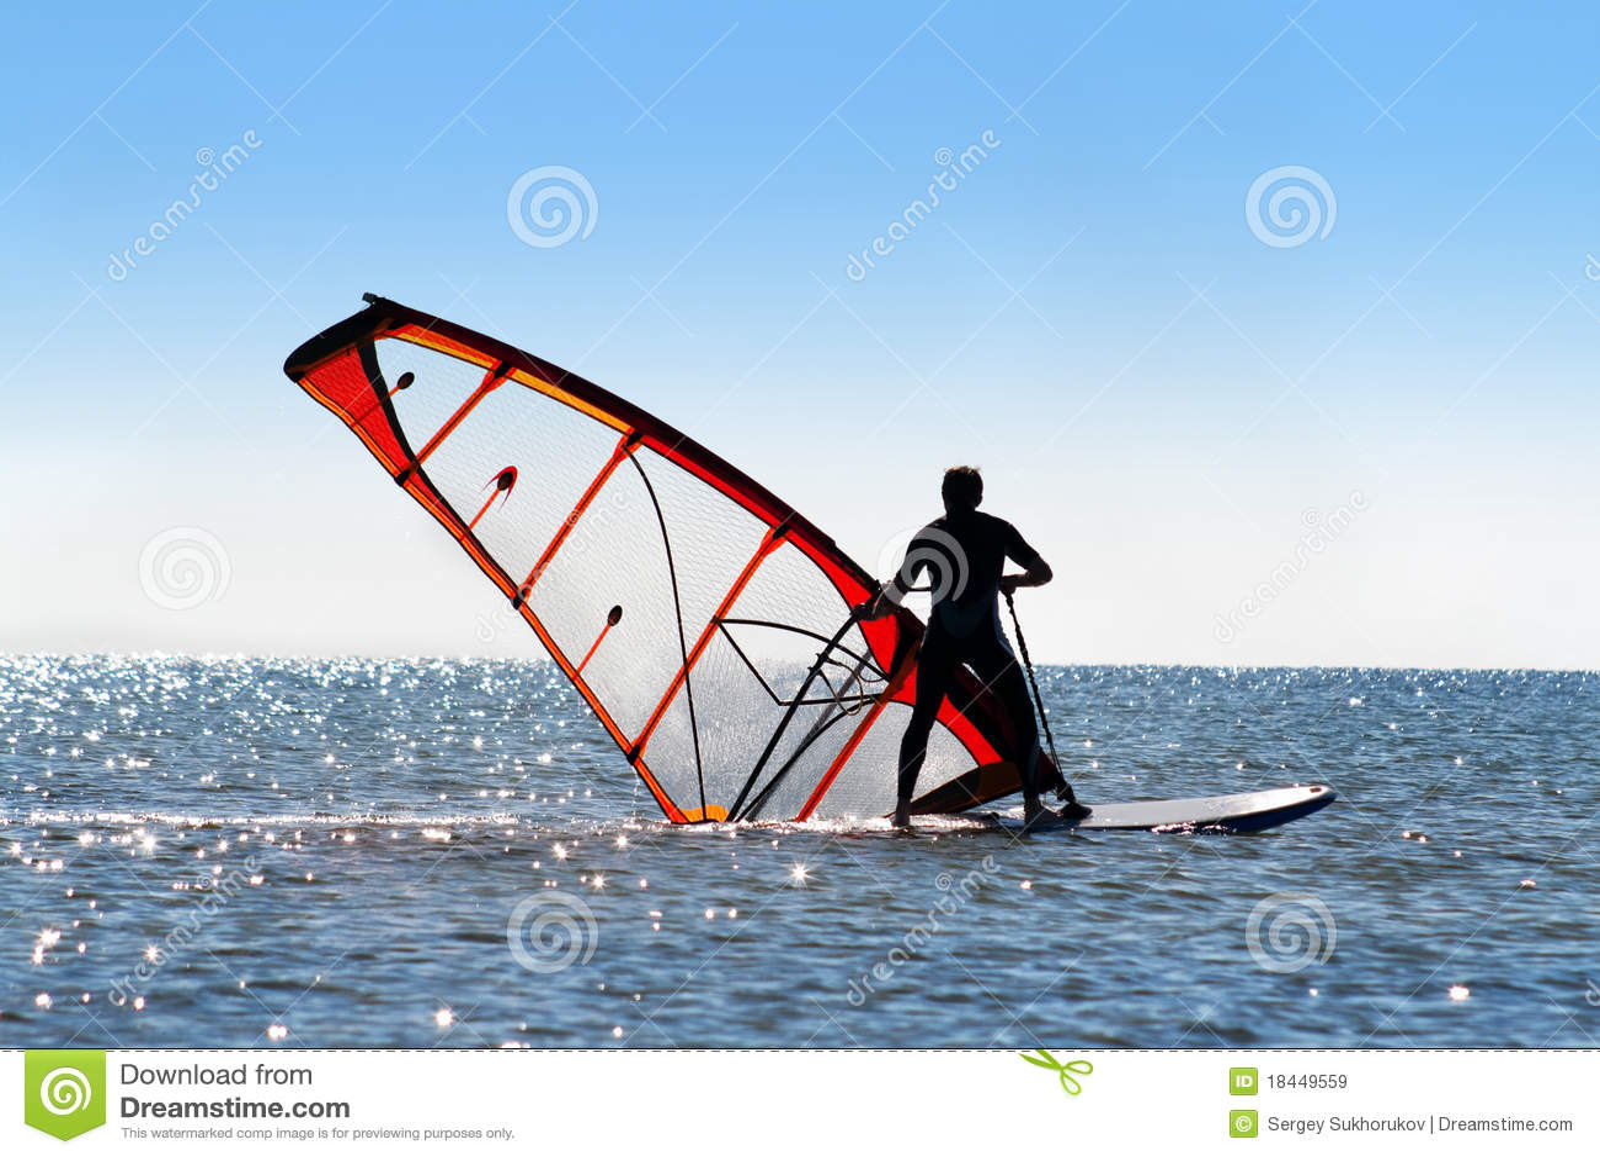 Windsurfer picks up the sail